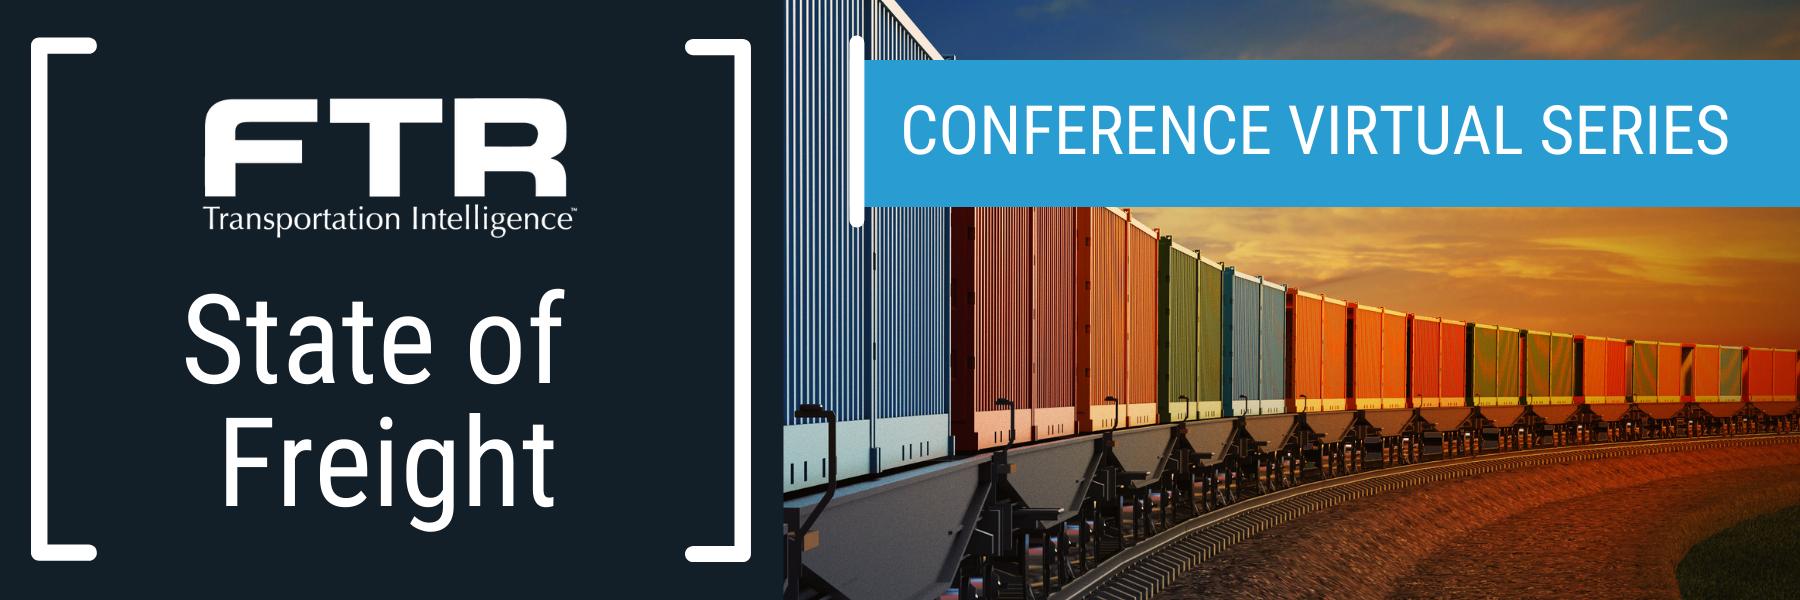 SOF Webinars - Conference Virtual Series